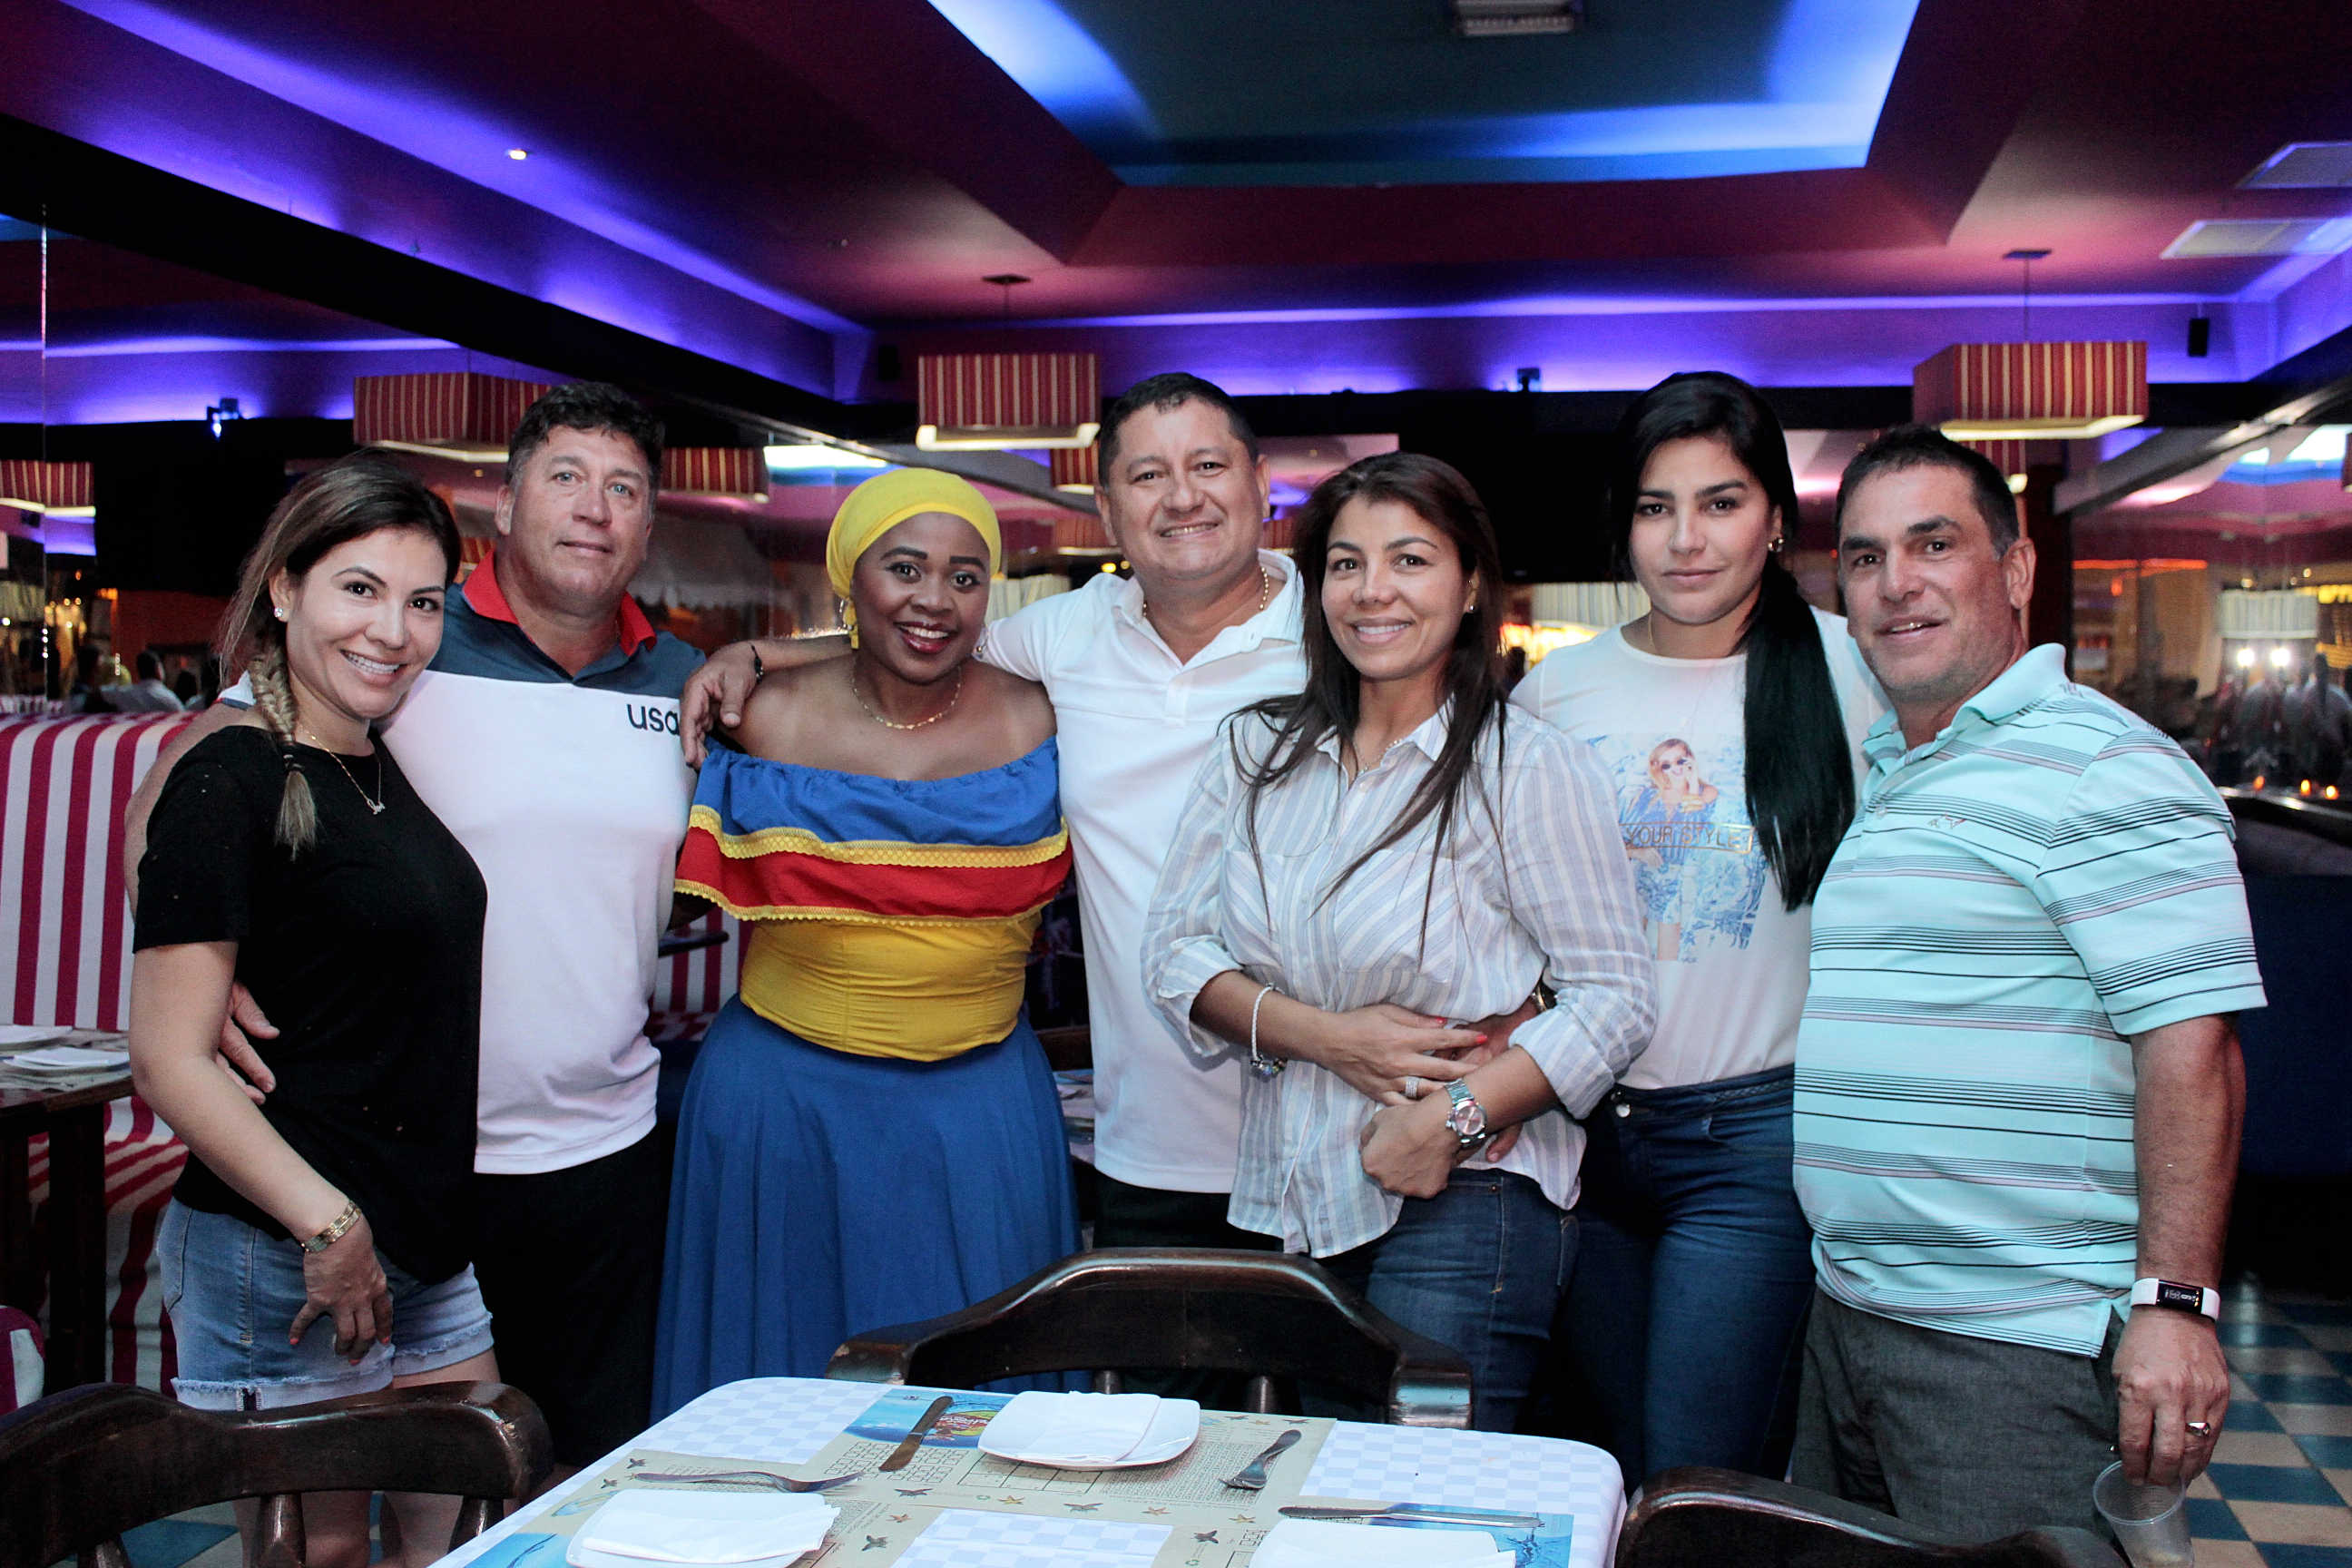 Bucaramanga julio 2016 - Cacique Centro Comercial